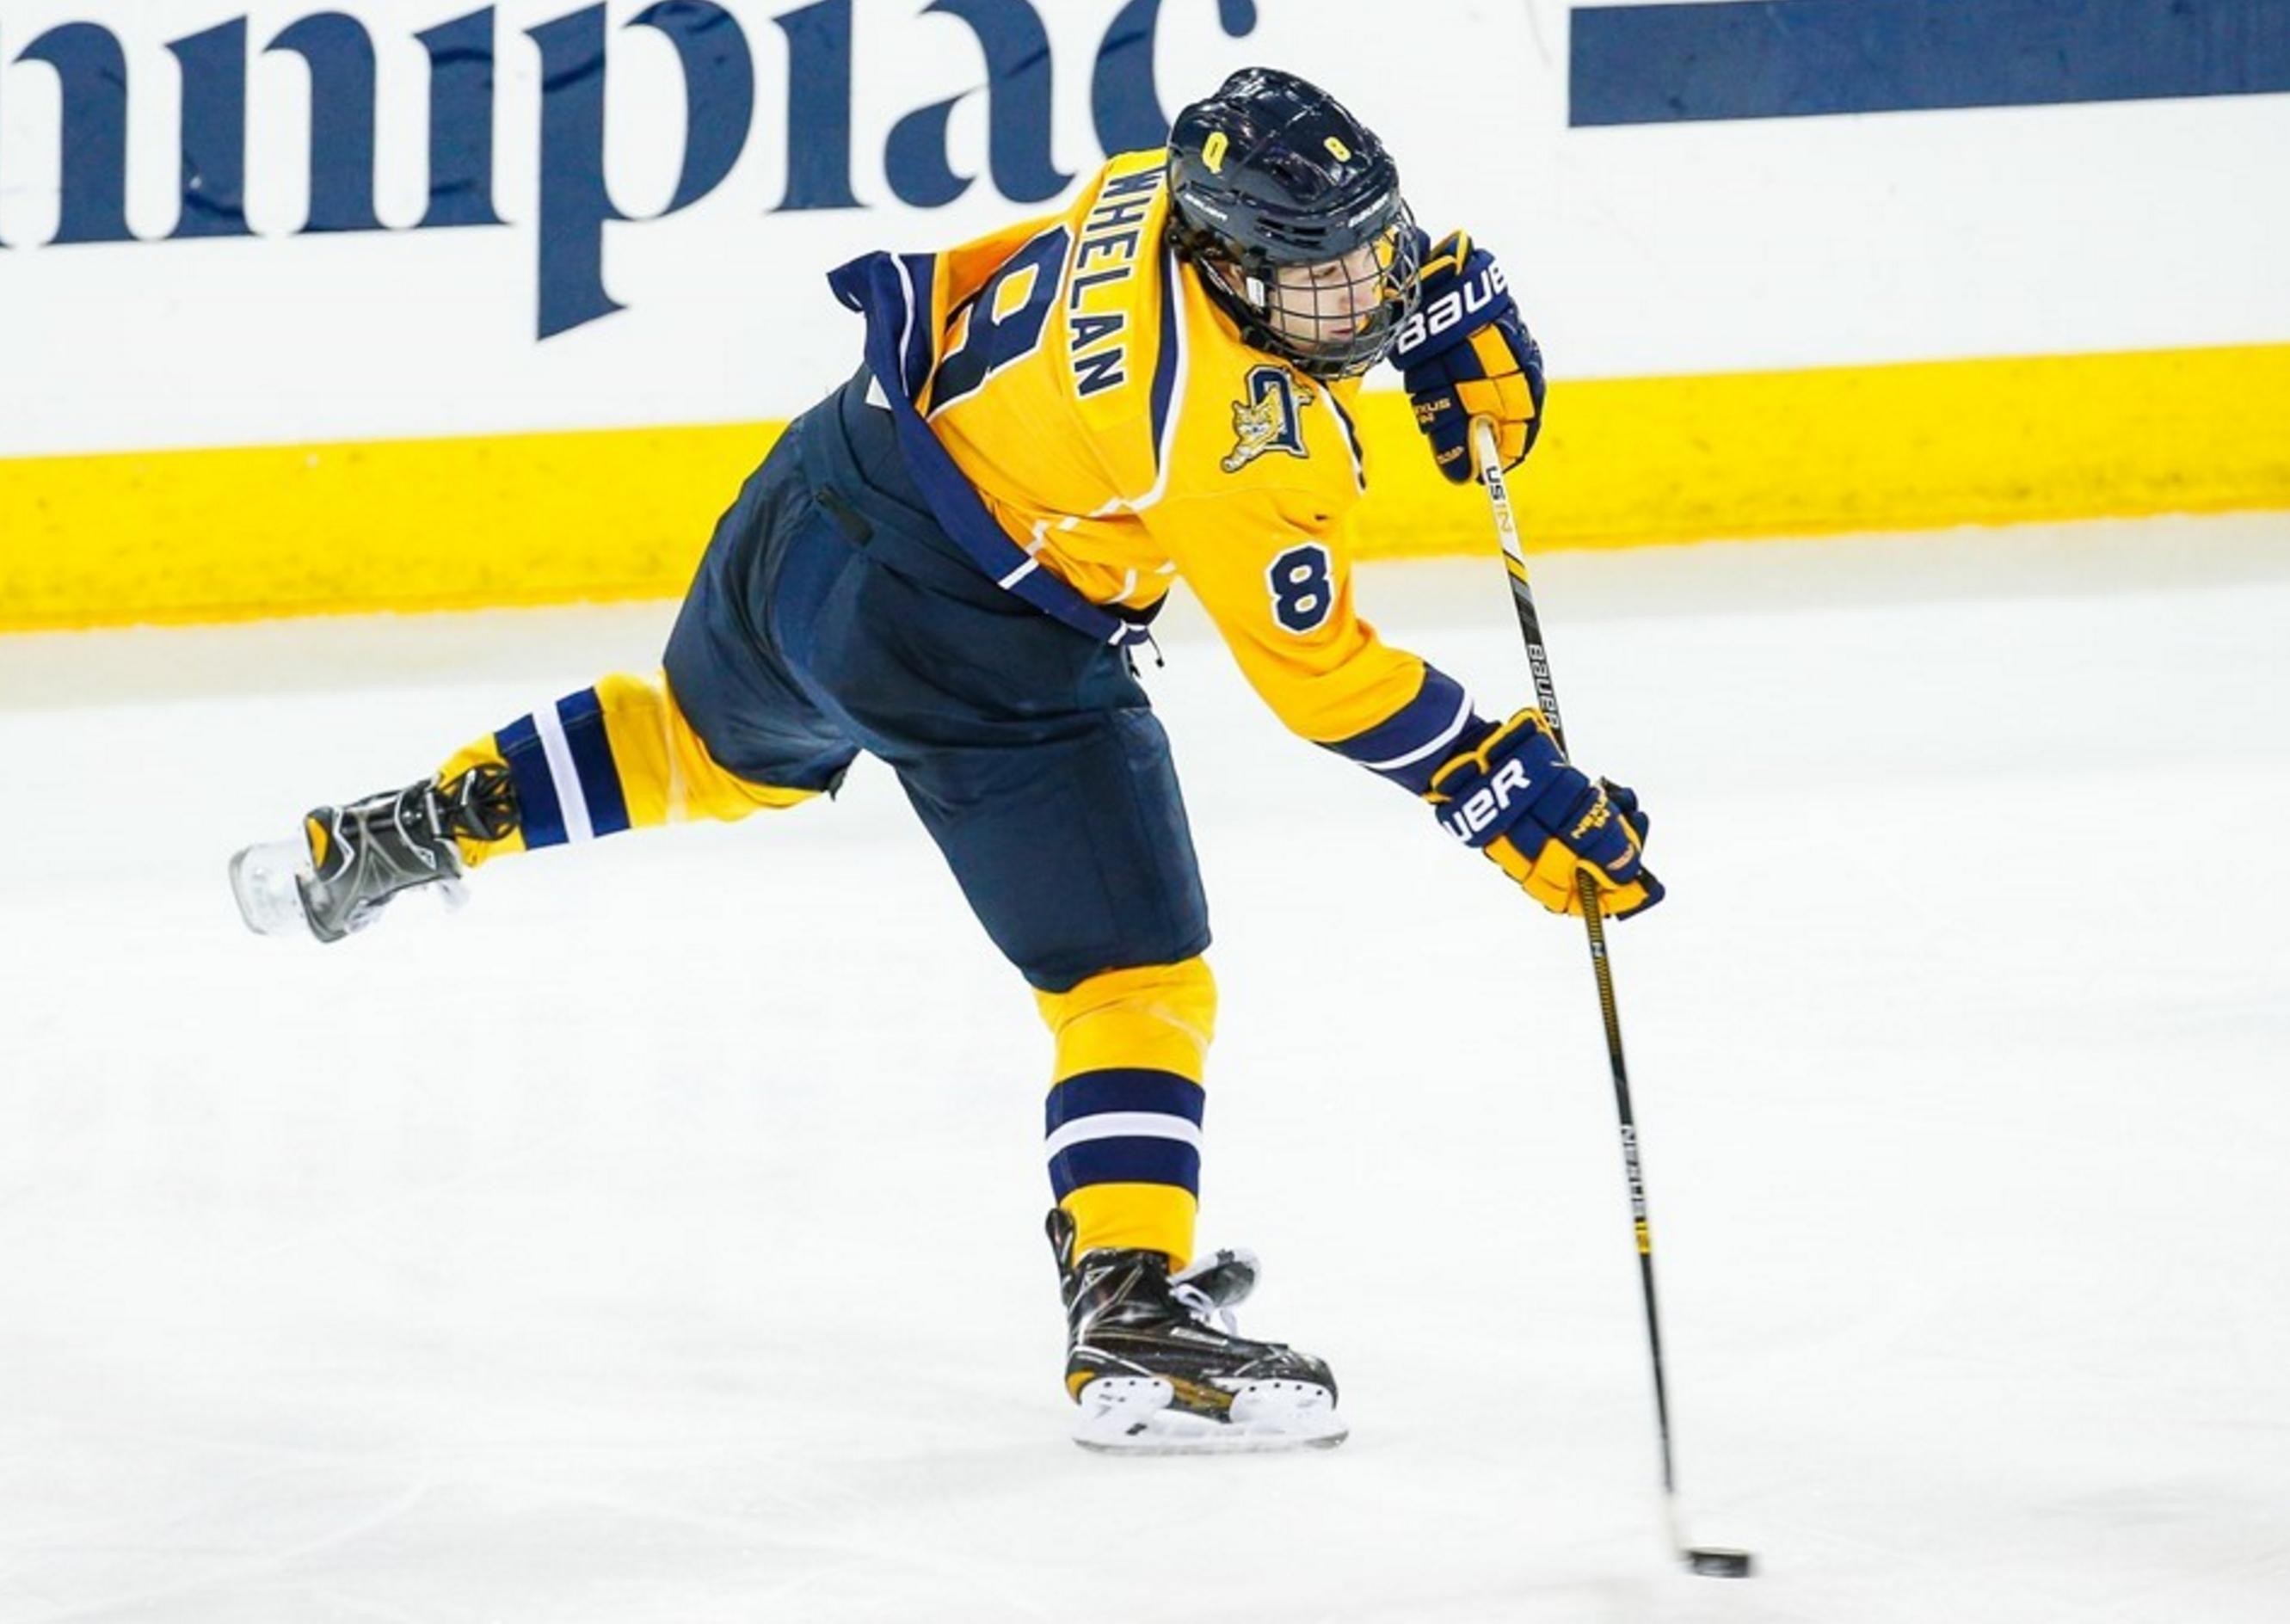 Weighing in on Alex Whelan's journey to the Quinnipiac men's ice hockey team